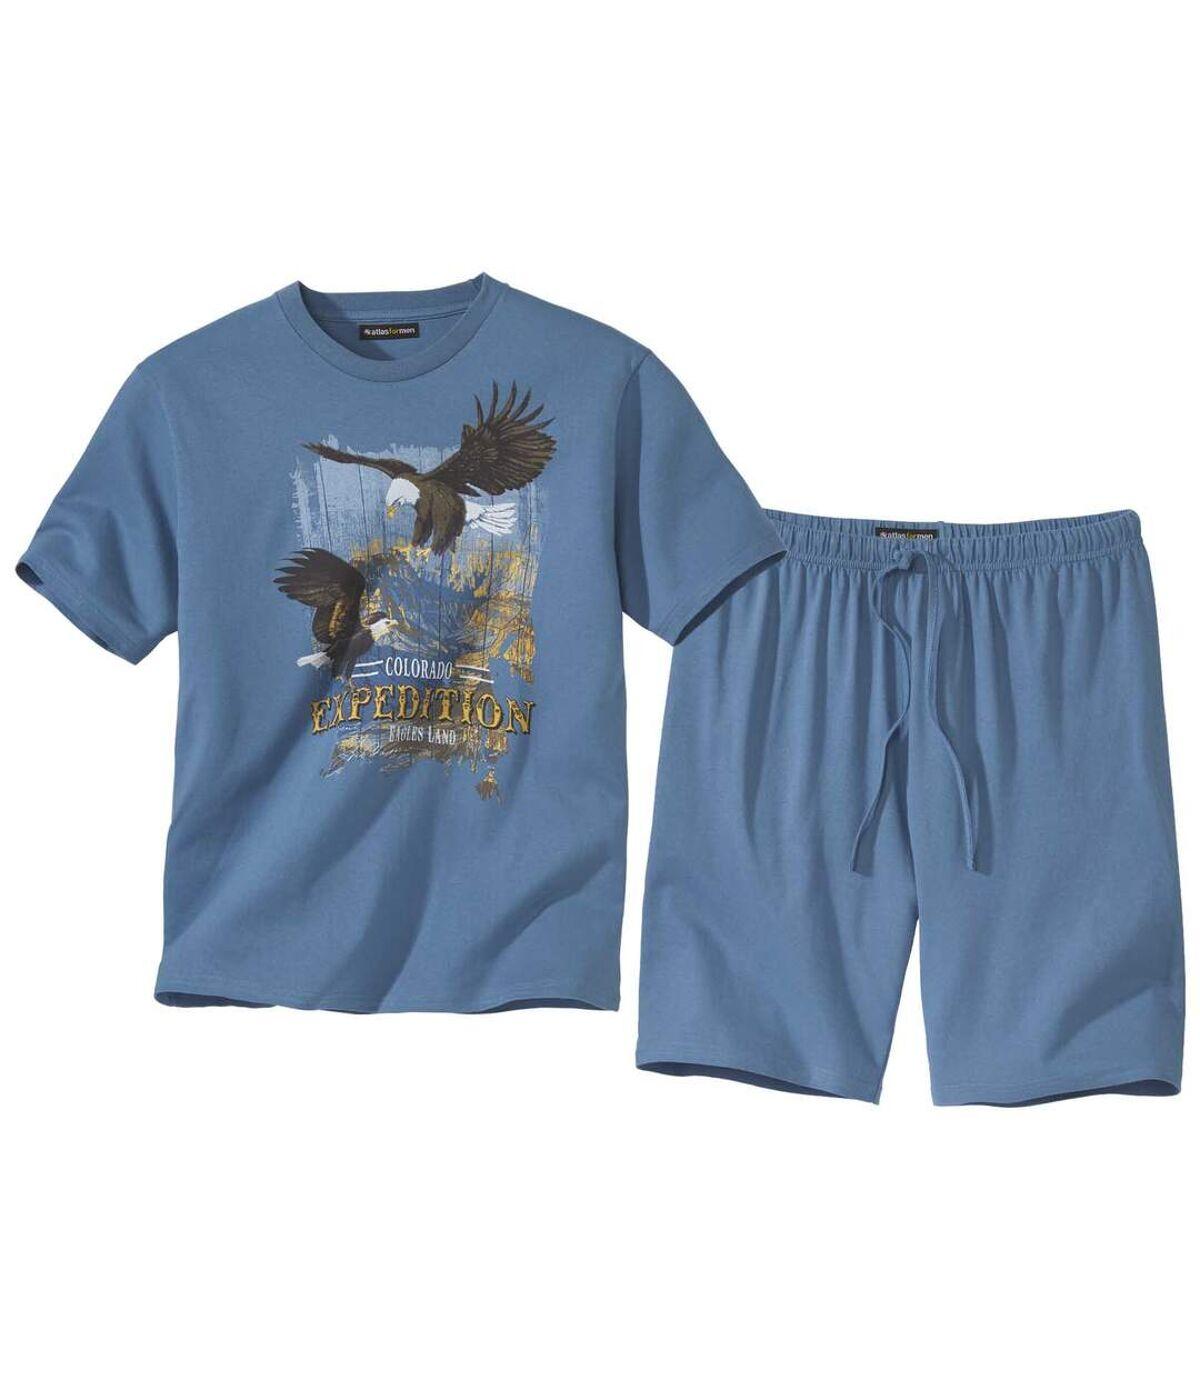 Piżama z szortami Colorado Eagles Atlas For Men